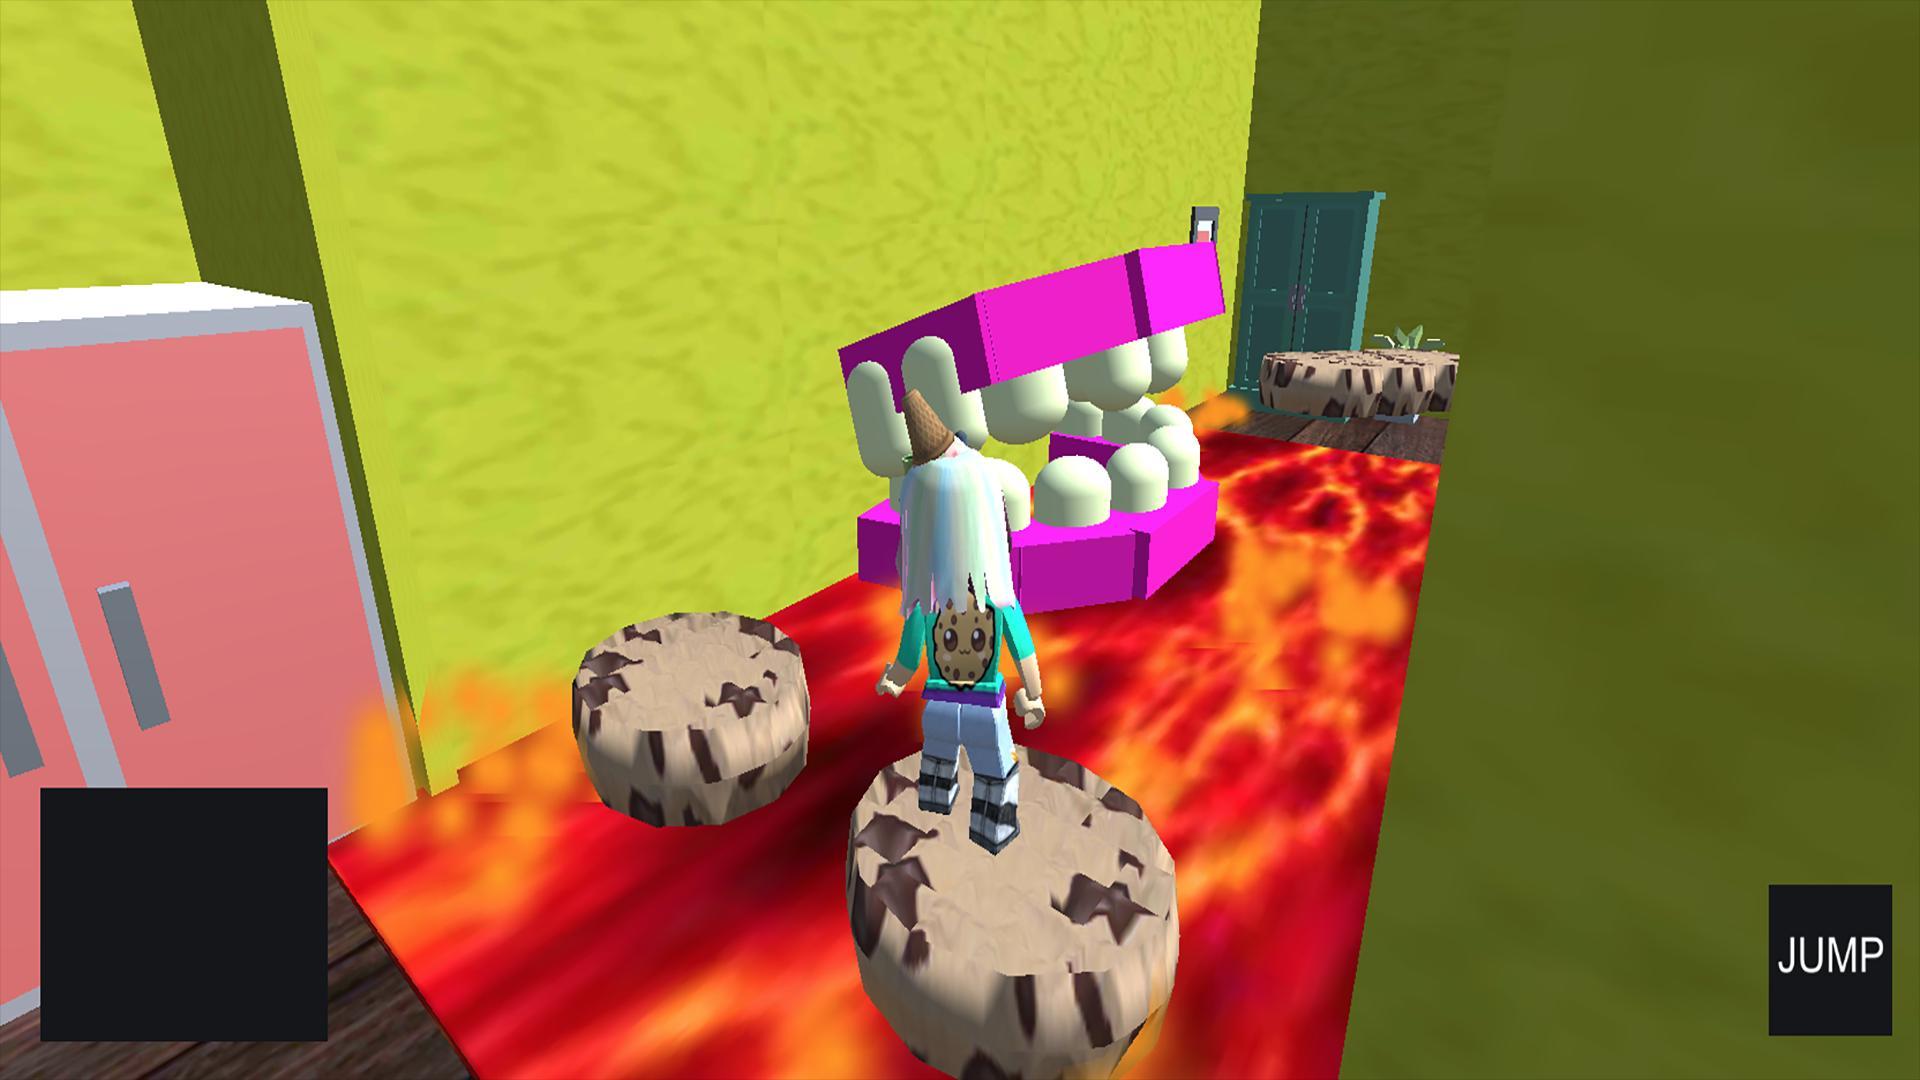 Crazy cookie swirl c robIox adventure 1.2 Screenshot 14